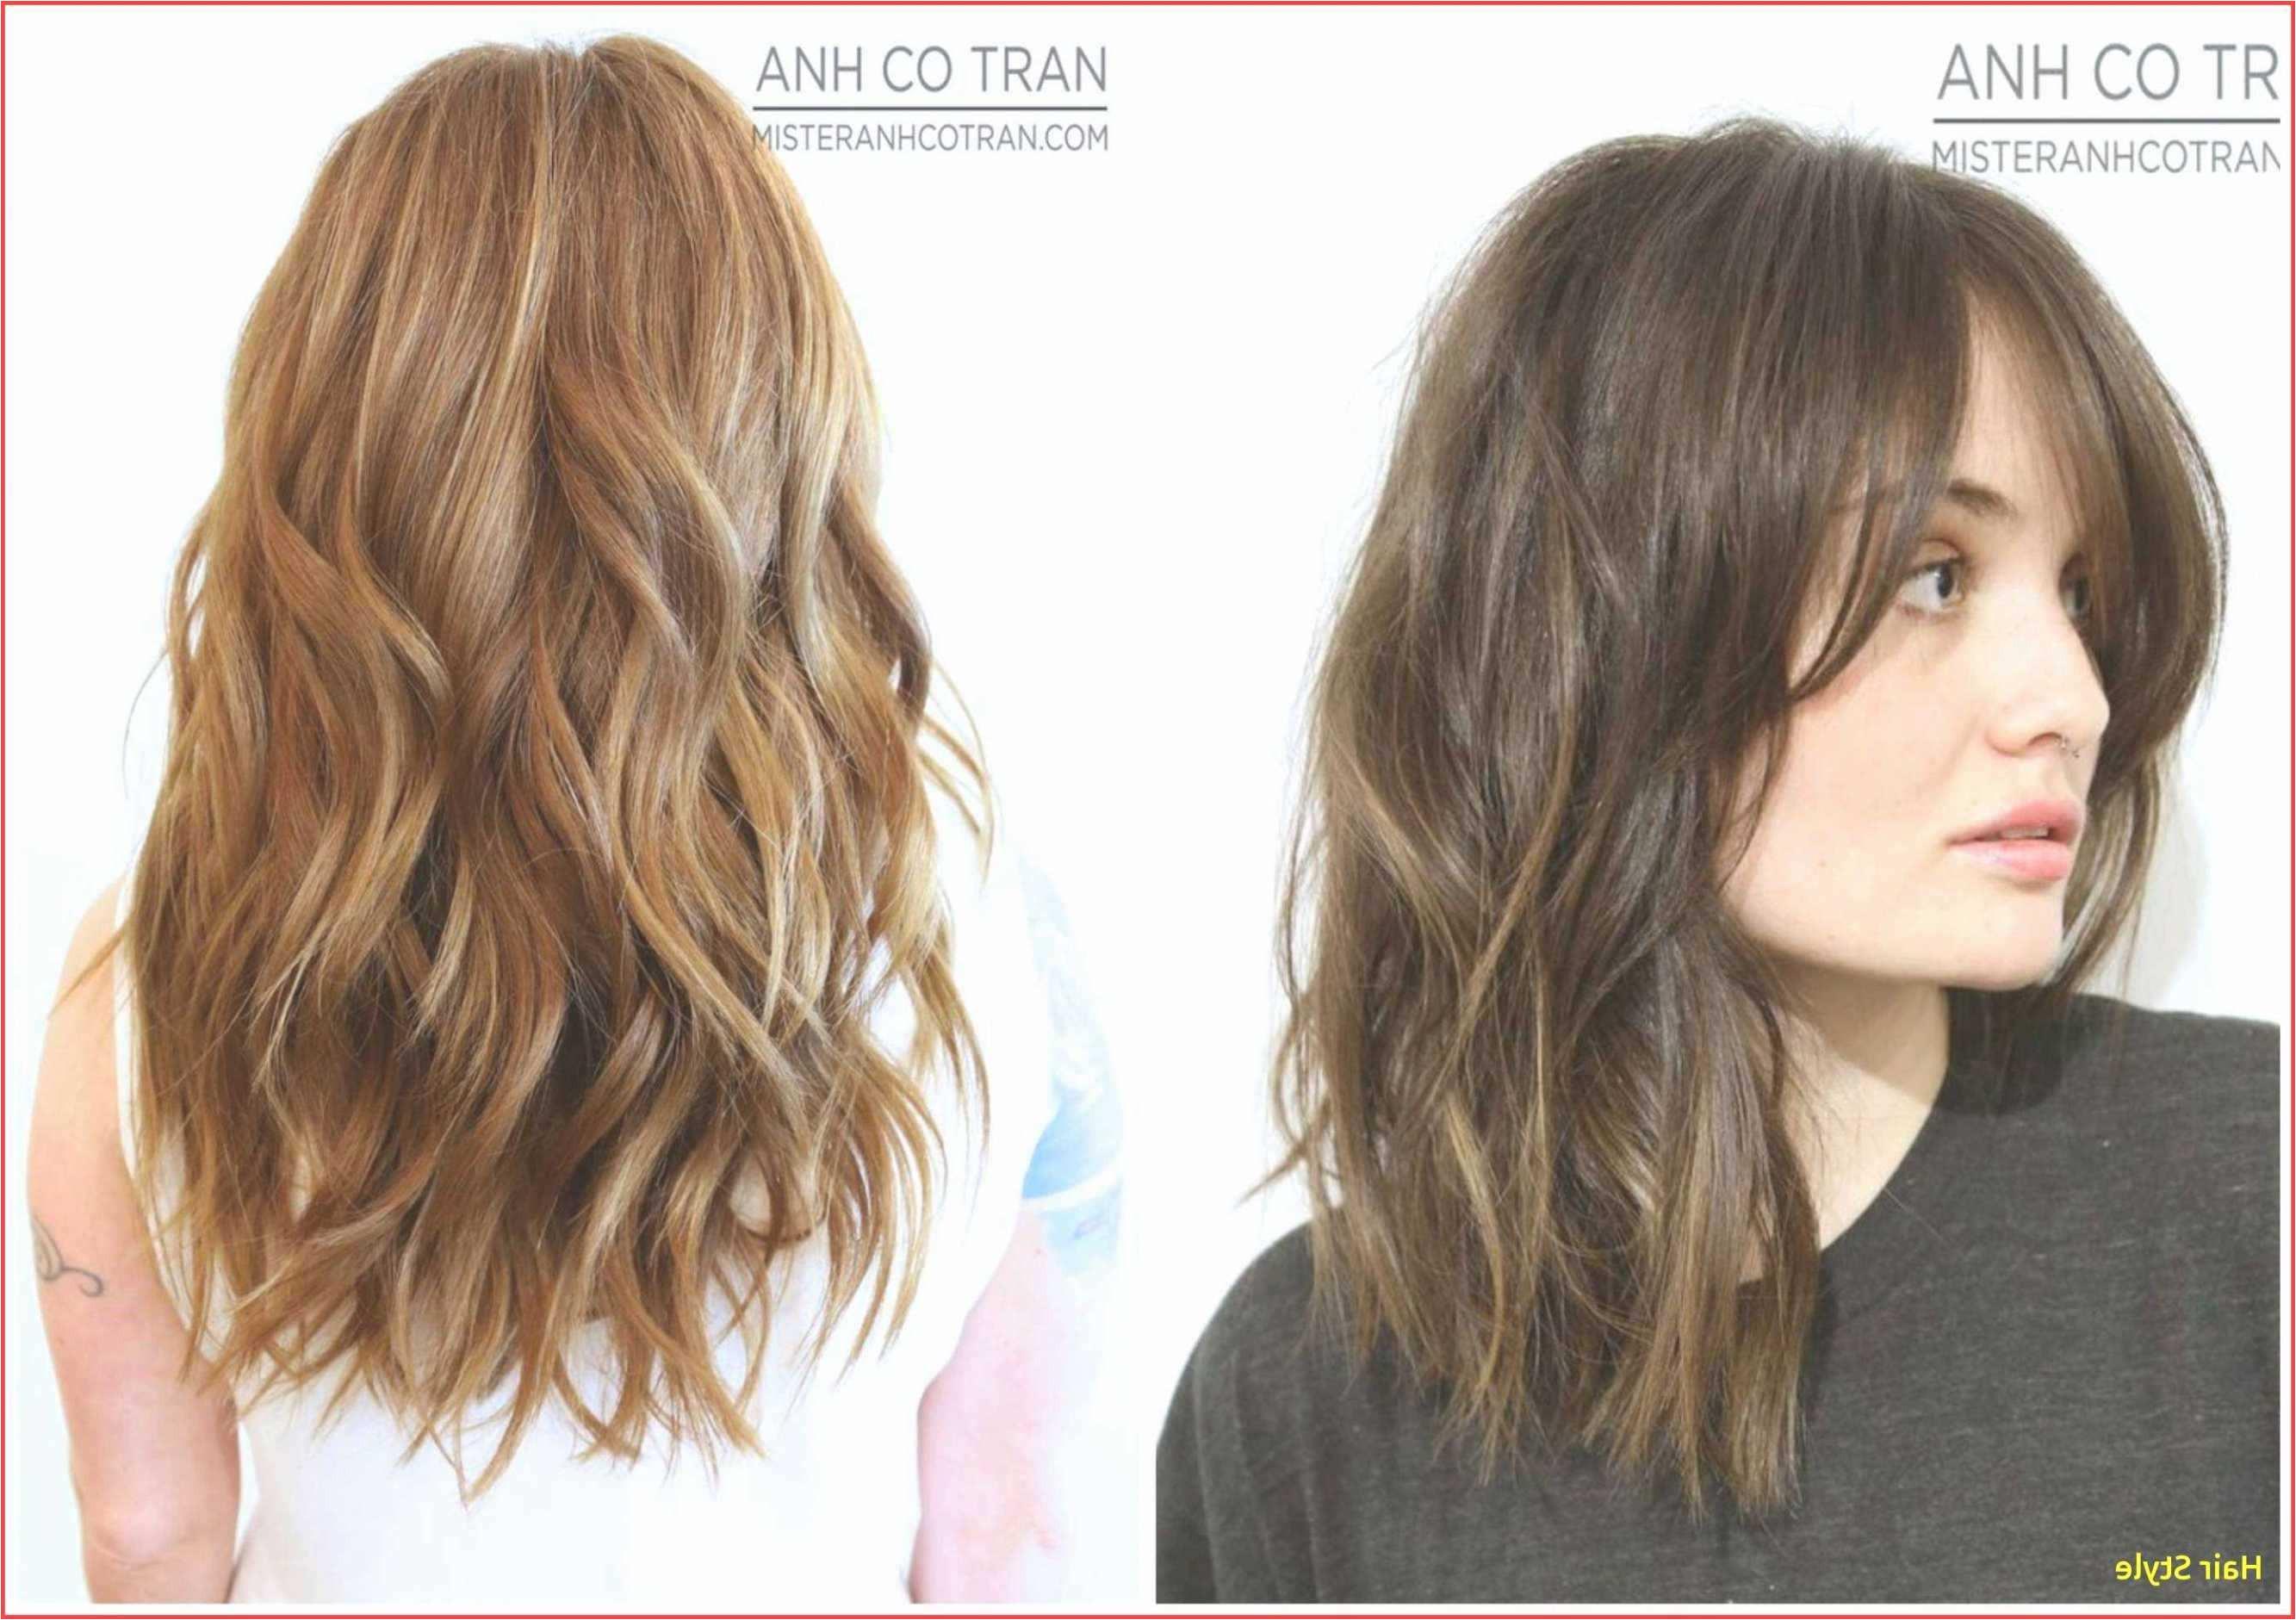 Korean Hairstyles for Girl Beautiful Beautiful Short Hairstyles for Wavy asian Hair Korean Hairstyles for